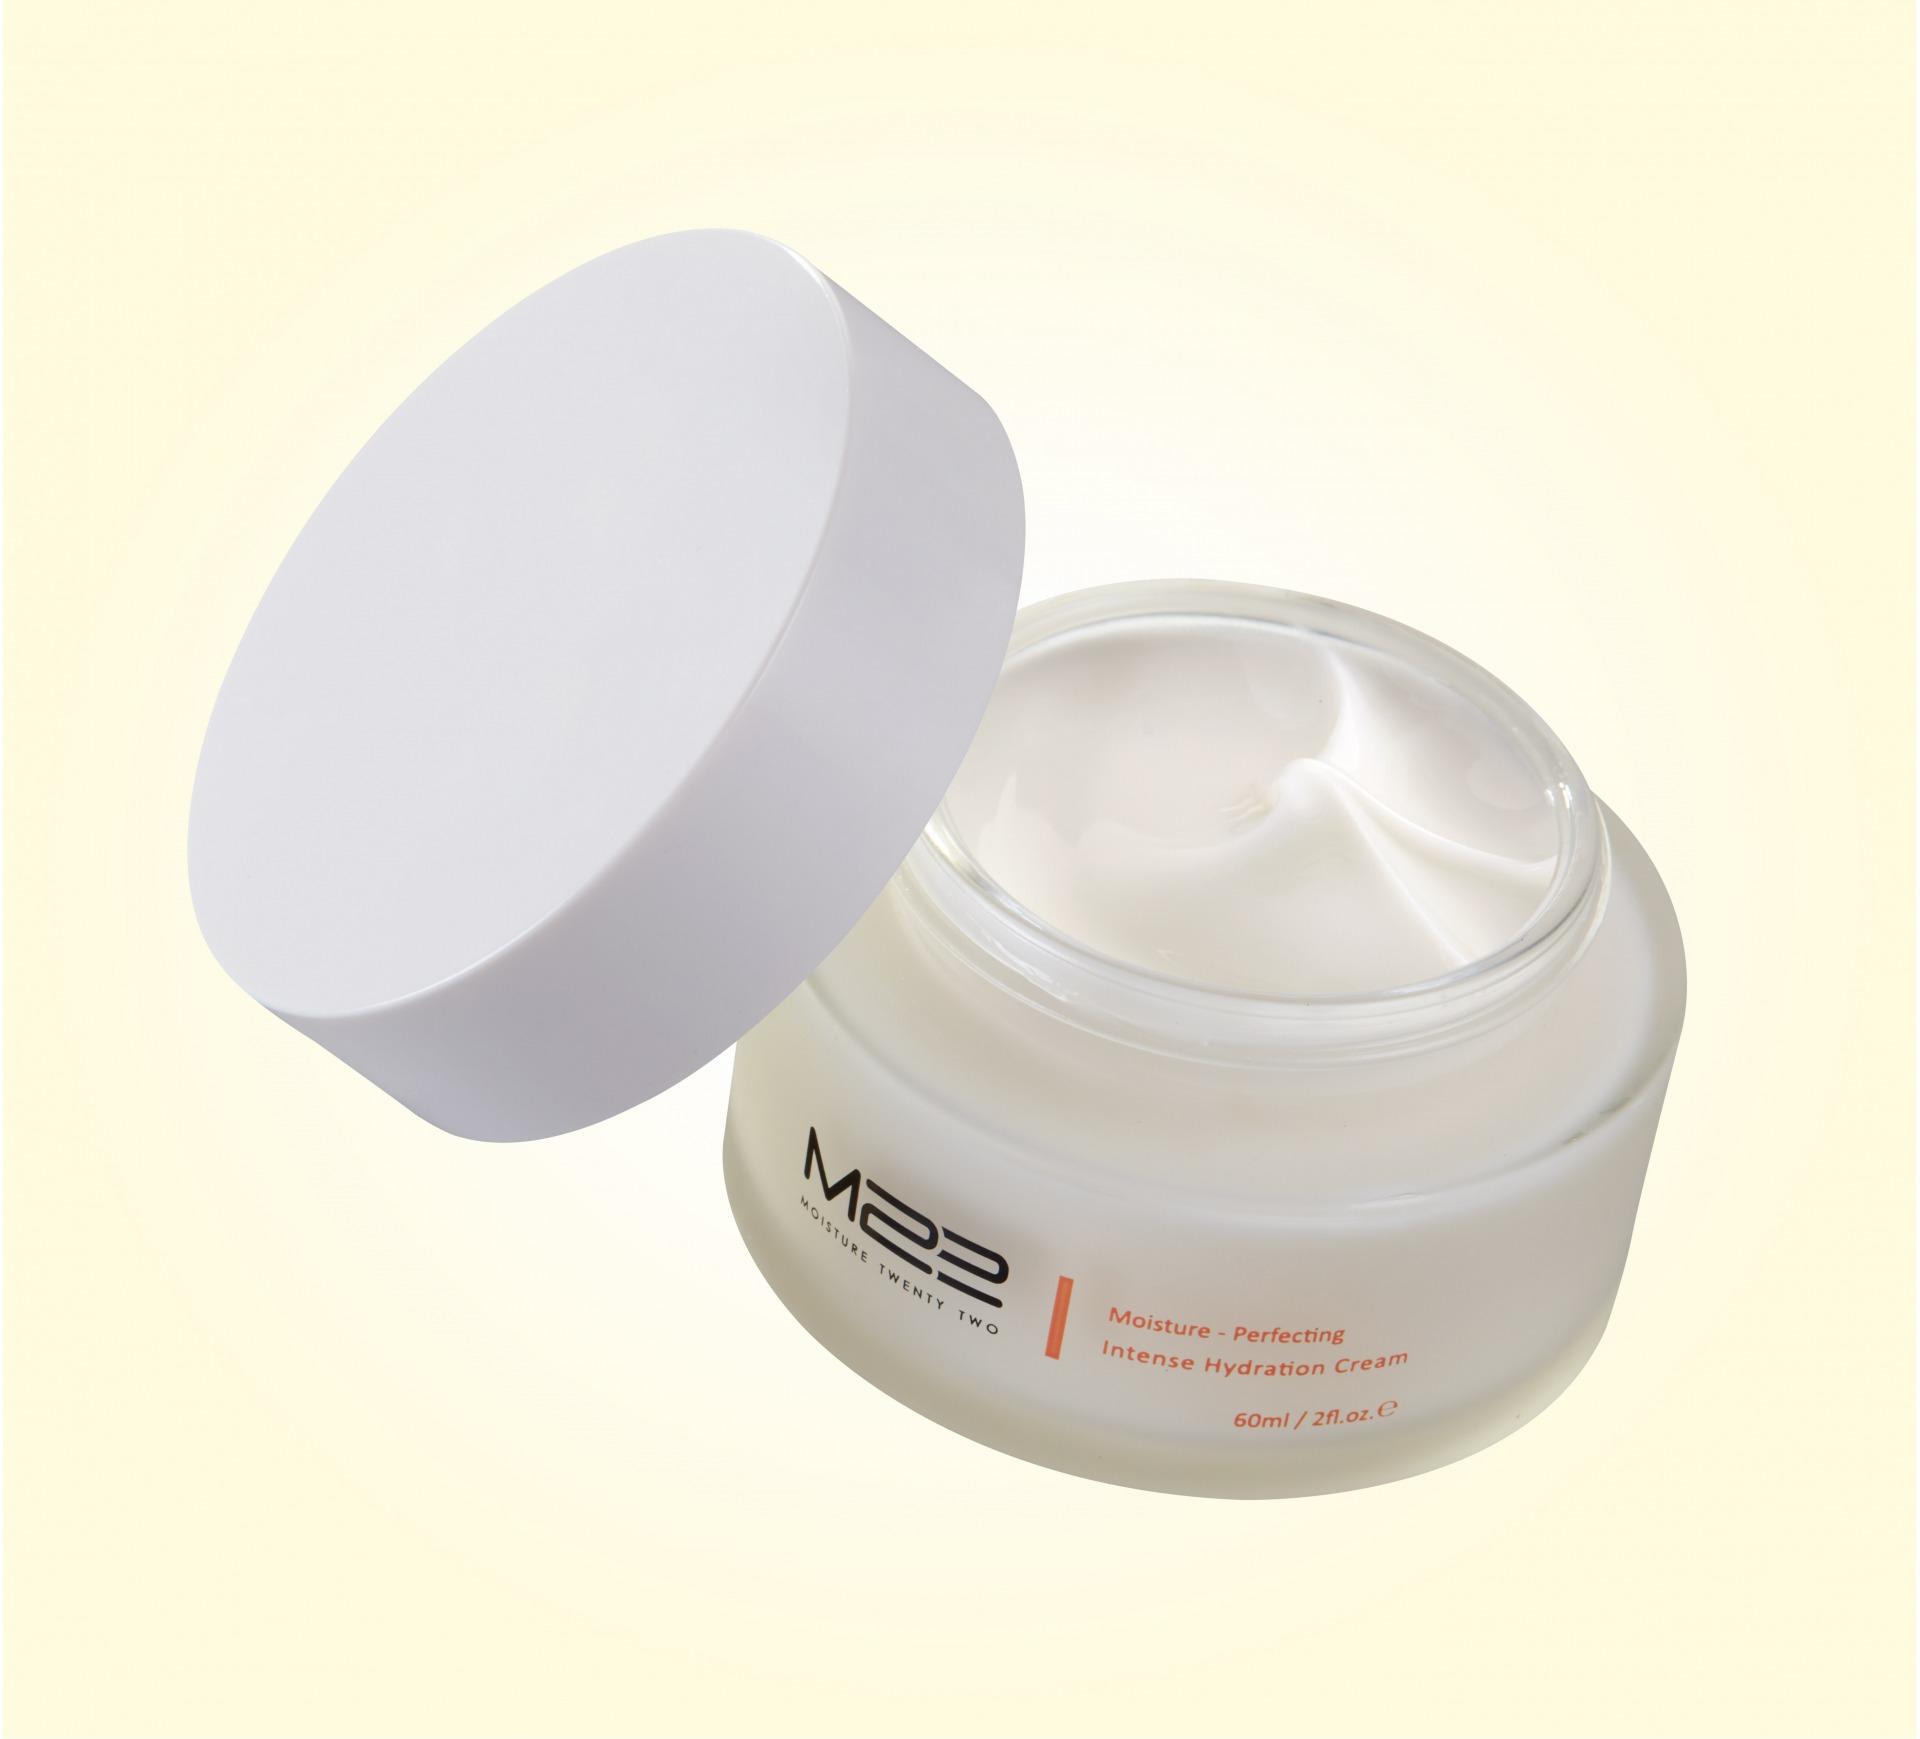 M22_v2_Products特潤保濕_特潤保濕乳霜V2_product01_01